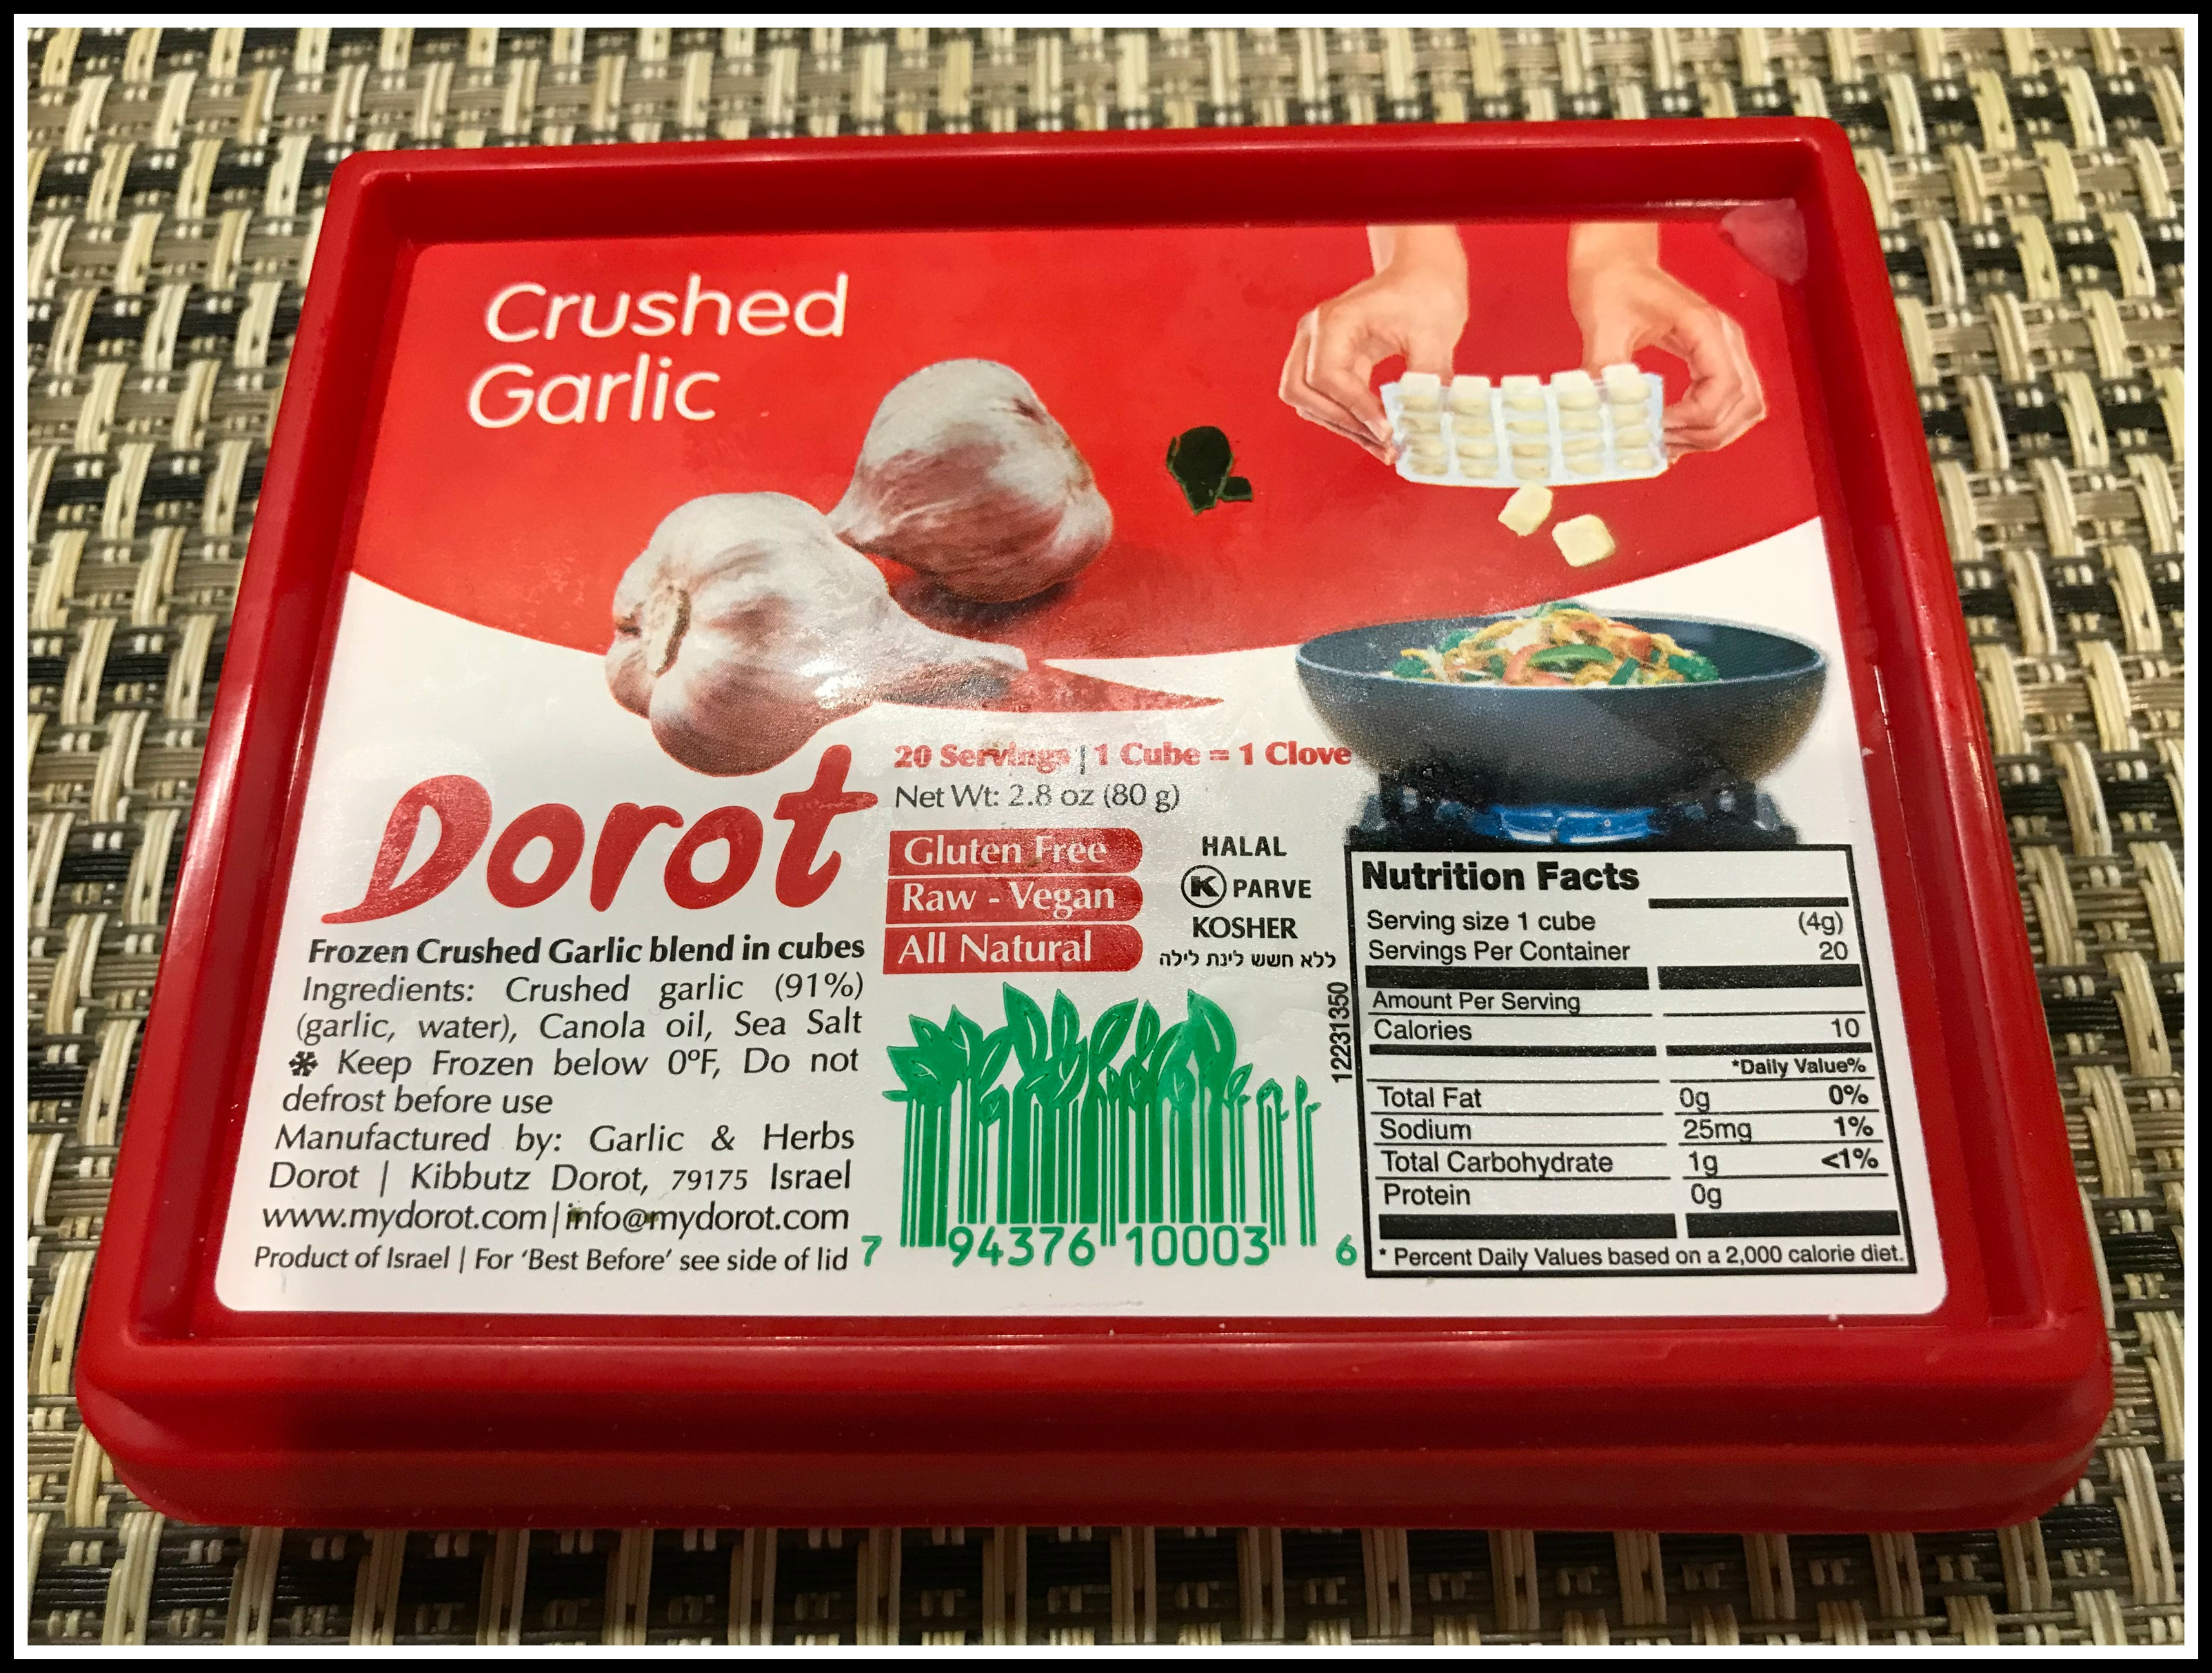 photo jan 09, 4 11 48 pm crushed garlic cube